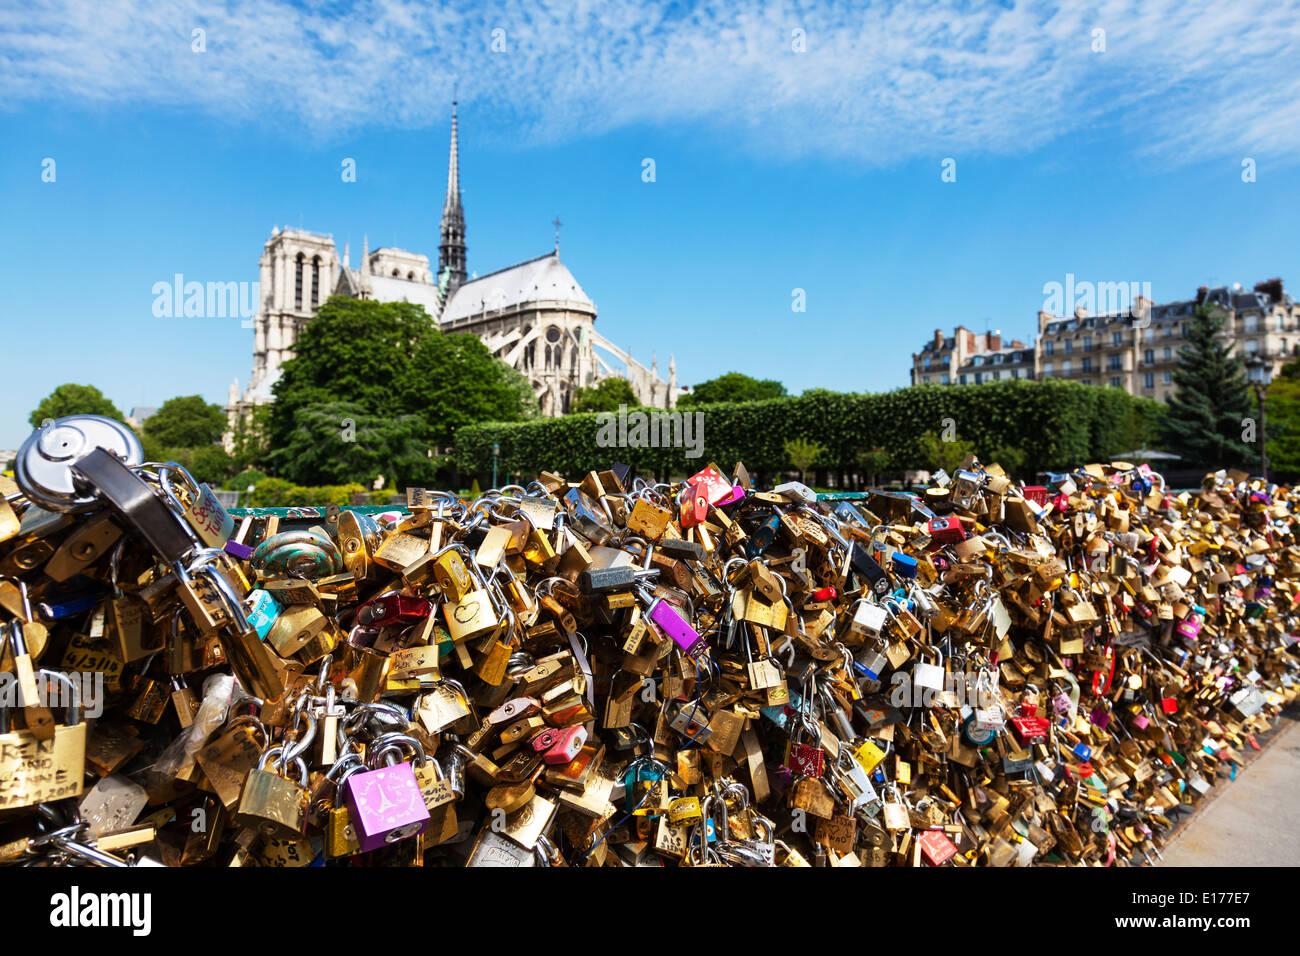 la sorbonne faaade catac nord de la. Exellent Nord Love Locks Along Pont De Lu0027Archevch Below Cathedral Notre Dame Paris  France With La Sorbonne Faaade Catac Nord De